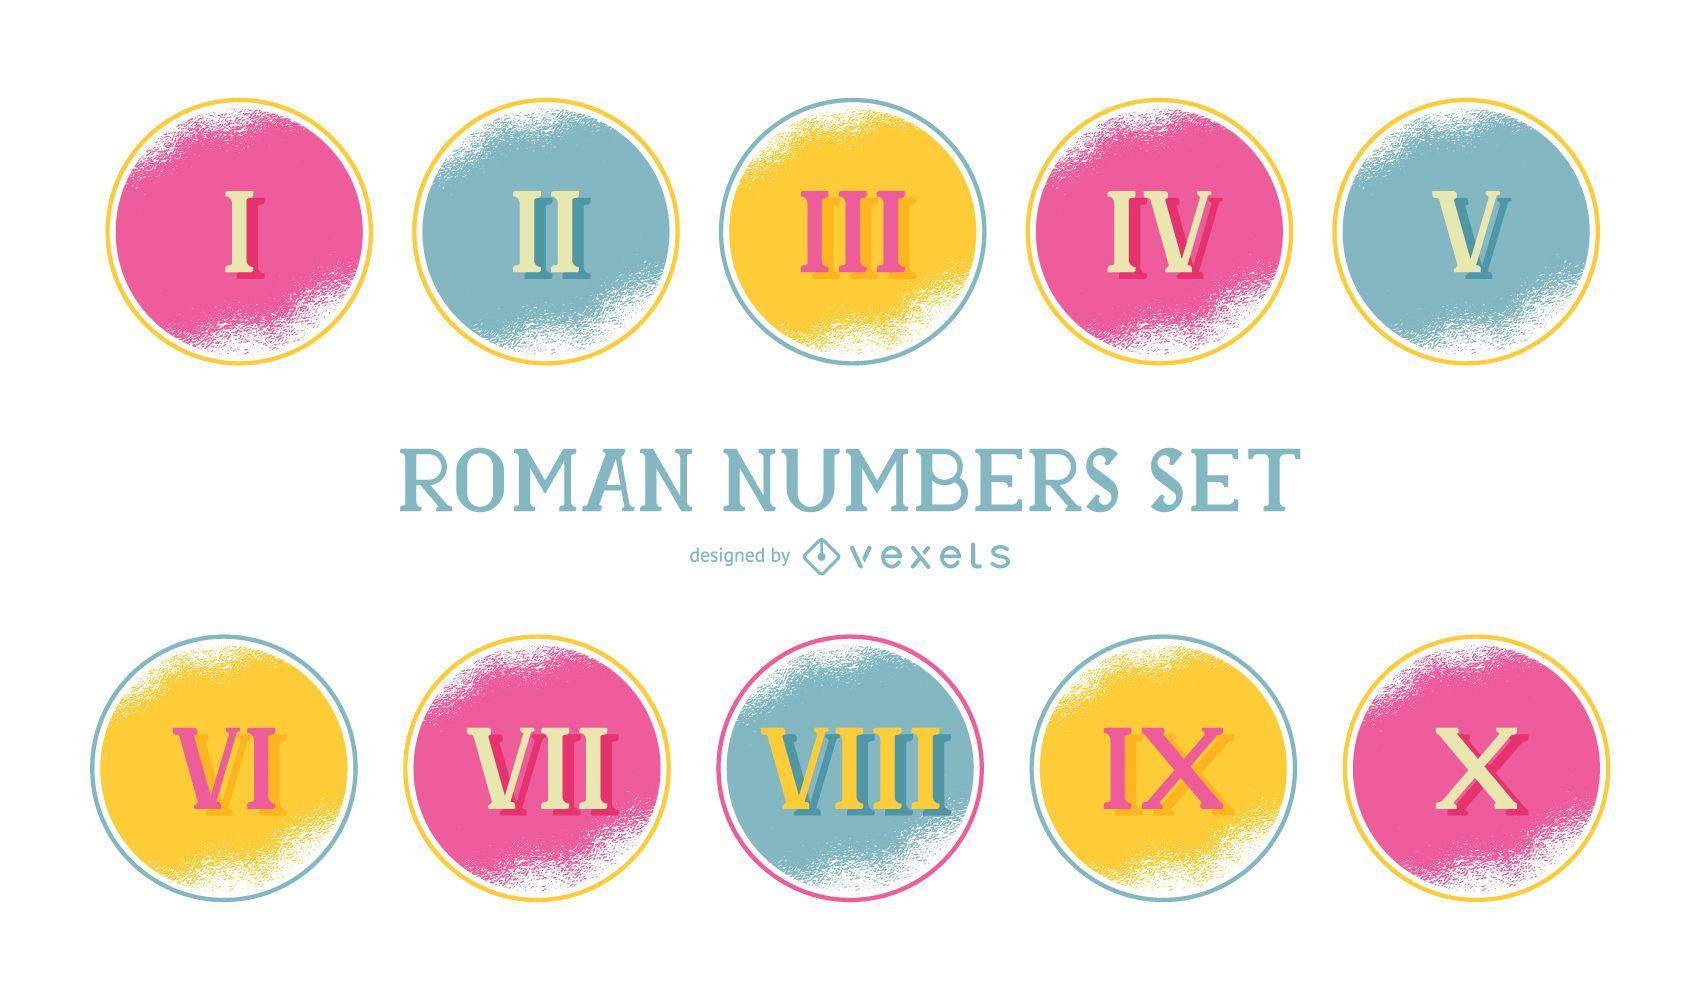 Roman Number Colorful Set